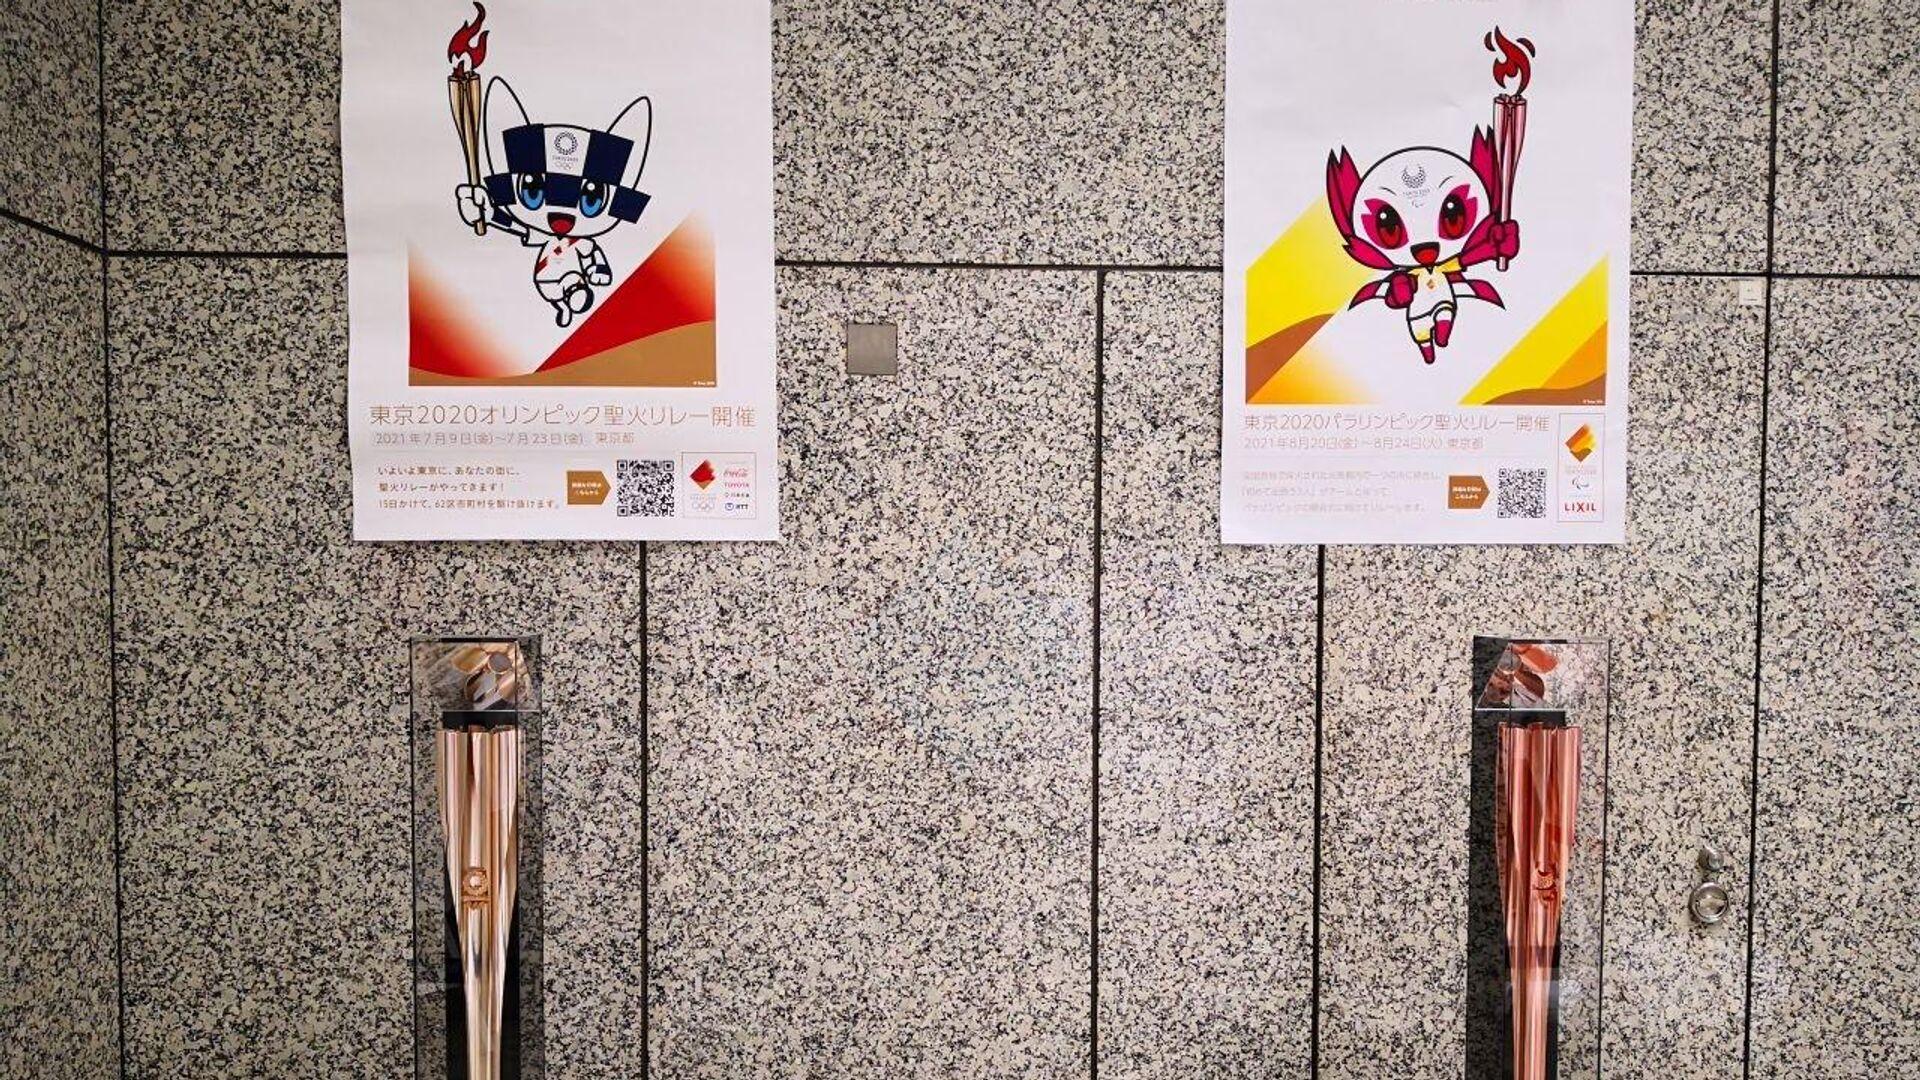 Факелы отложенных на год из-за COVID-19 Олимпиады-2020 и Паралимпийских игр в Токио  - РИА Новости, 1920, 22.01.2021